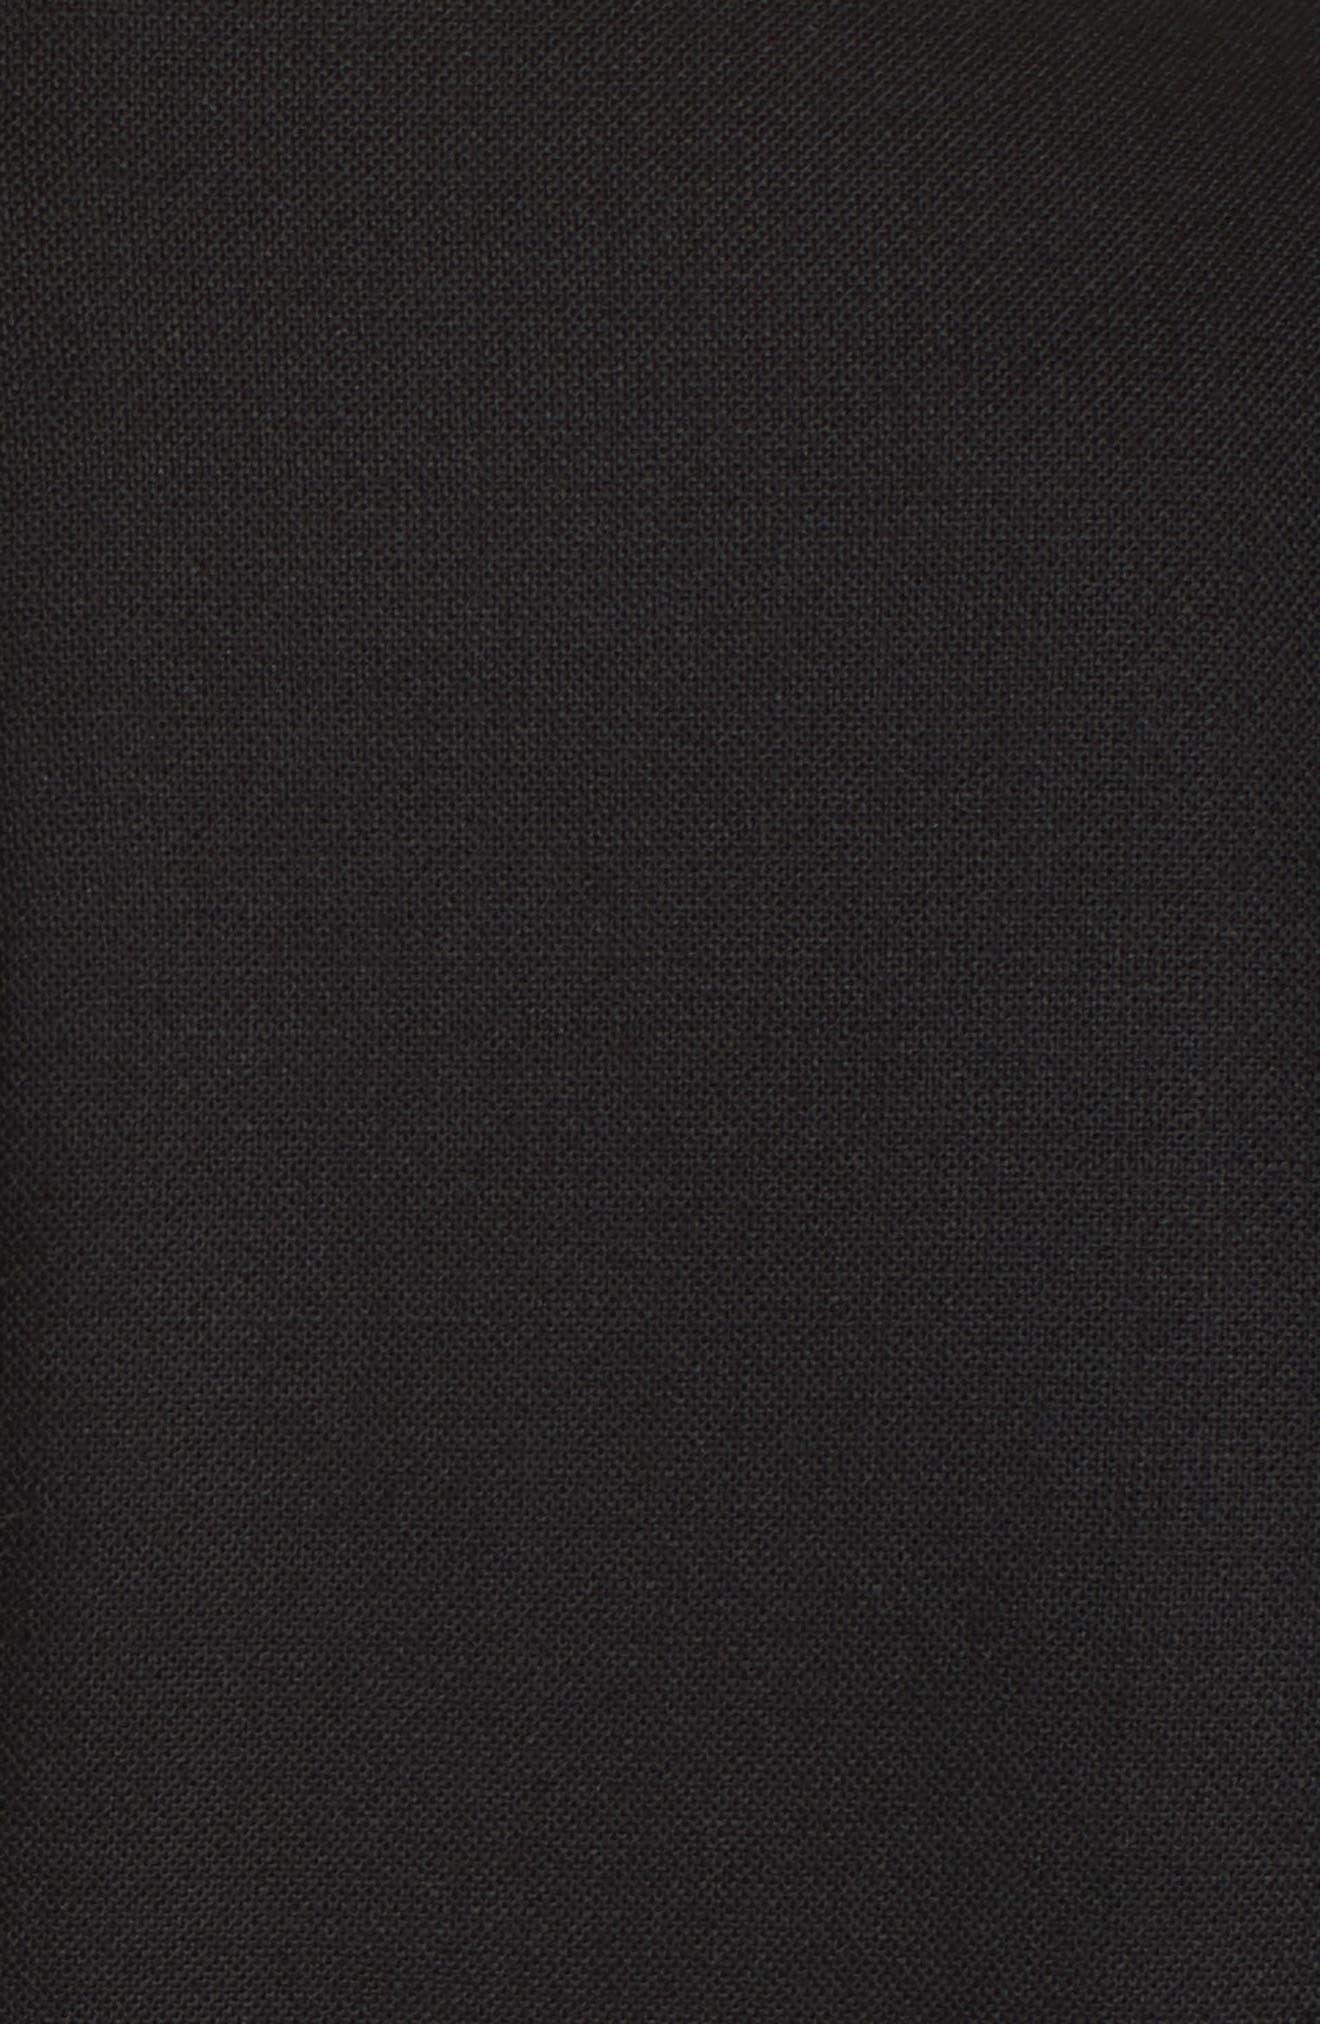 MAX MARA,                             Karub Belted Stretch Wool Dress,                             Alternate thumbnail 5, color,                             001